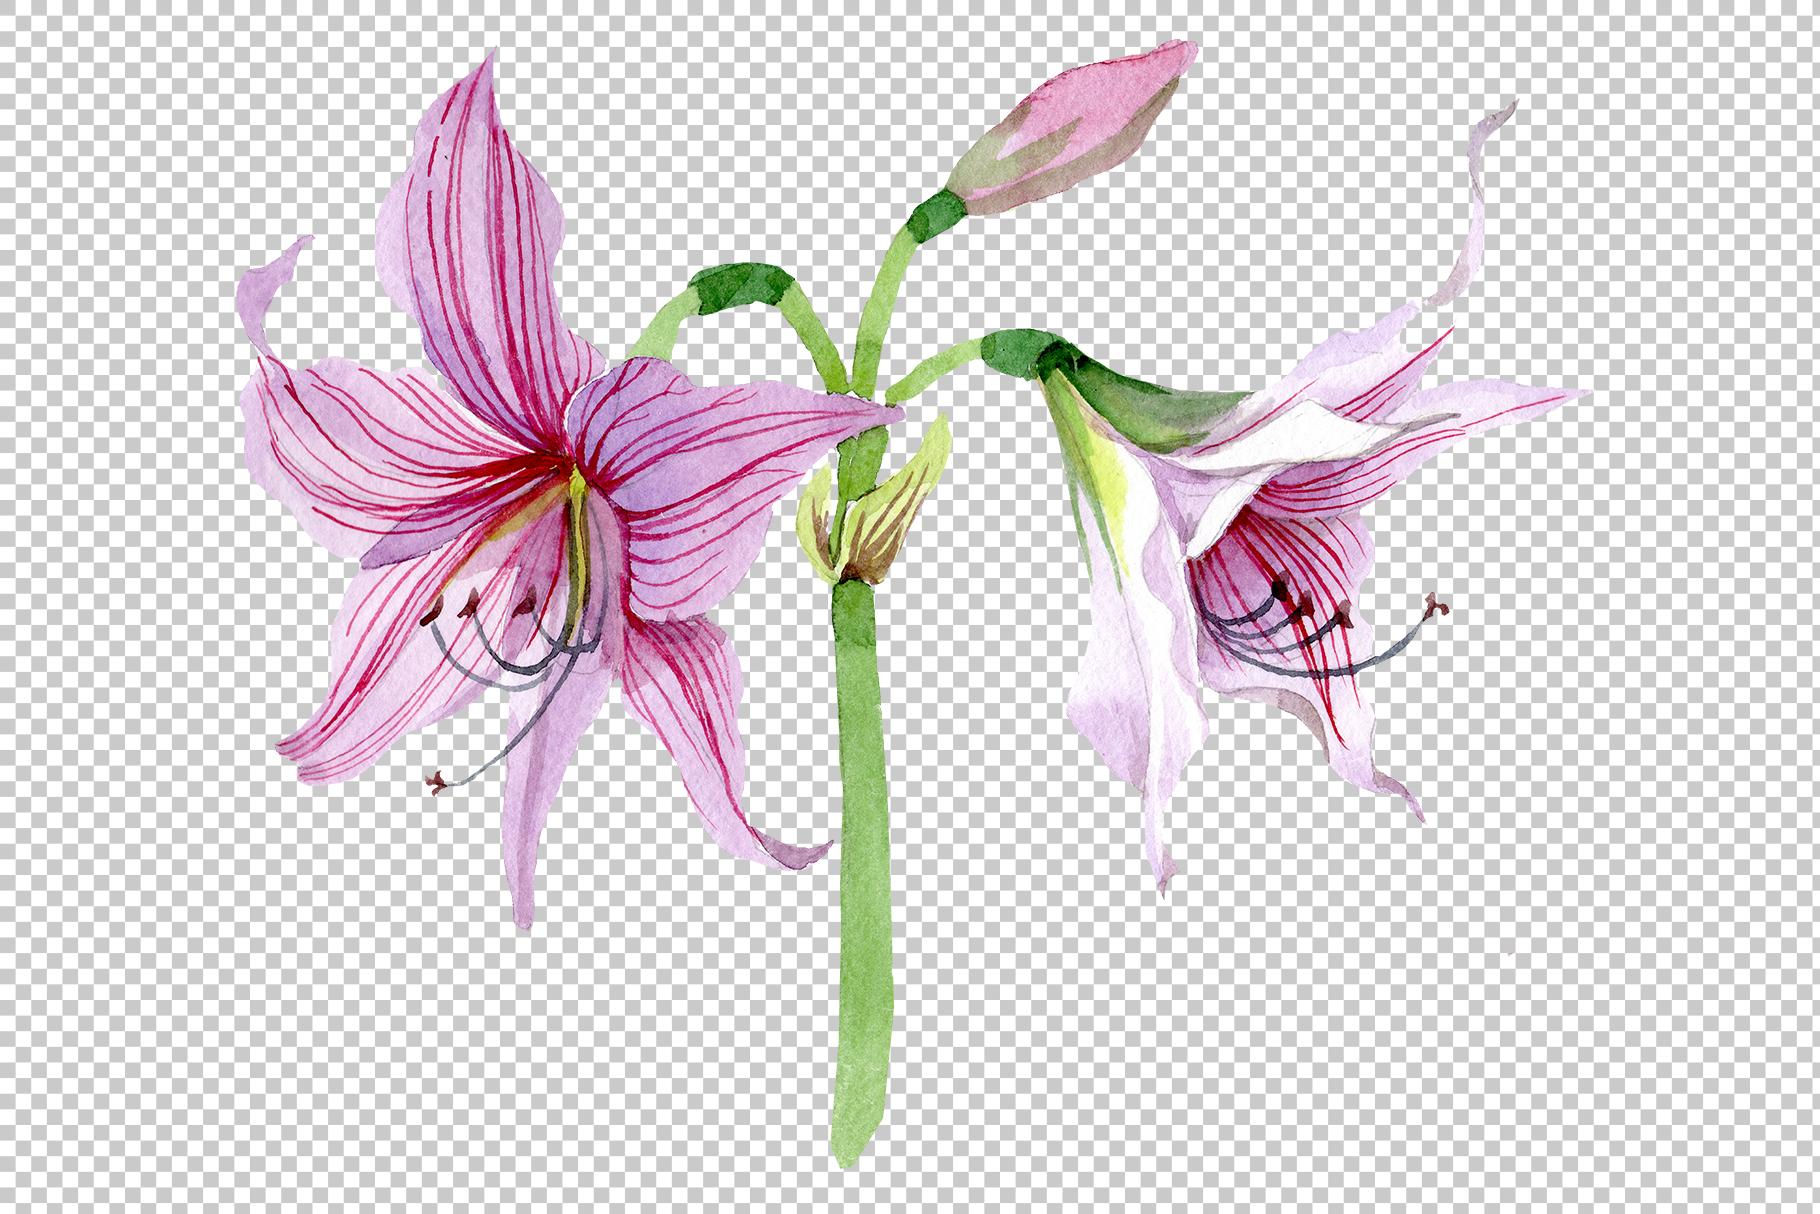 Purple amaryllis PNG watercolor flower set example image 2